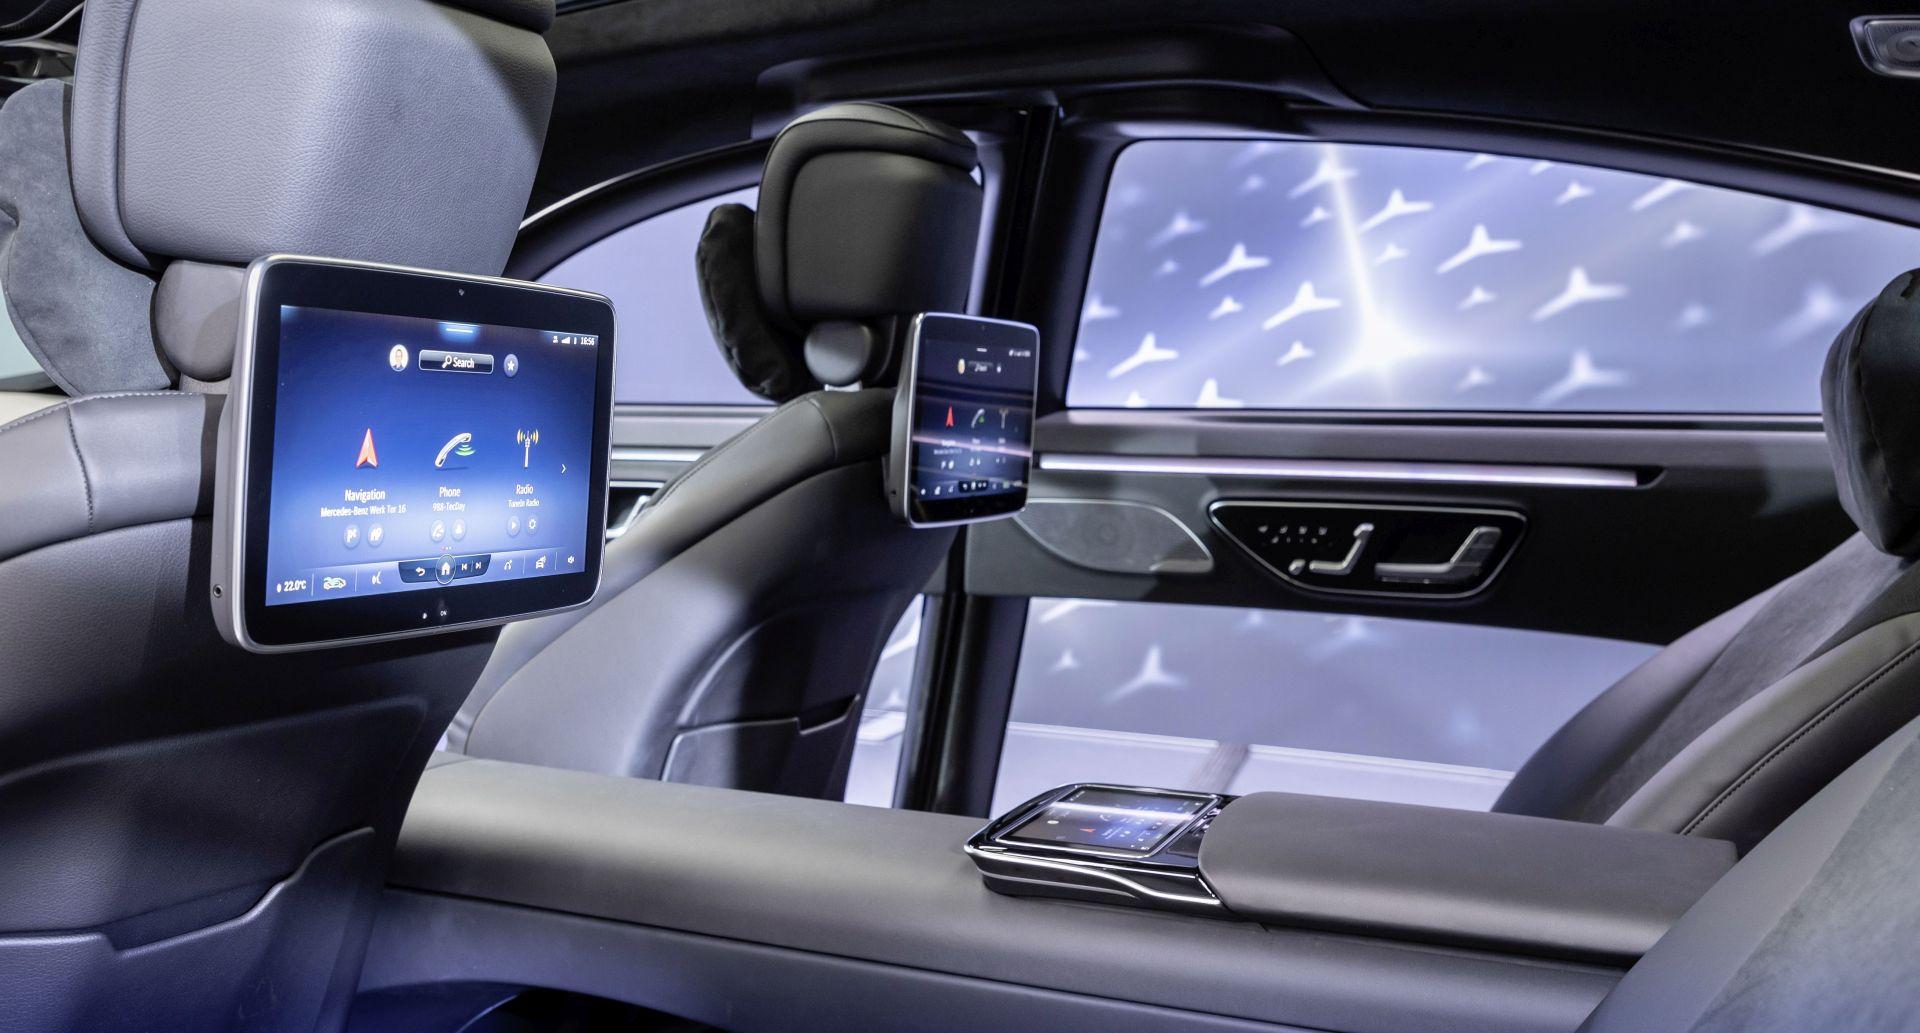 Nova Mercedes-Benz S-klasa donosi još napredniji MBUX sustav